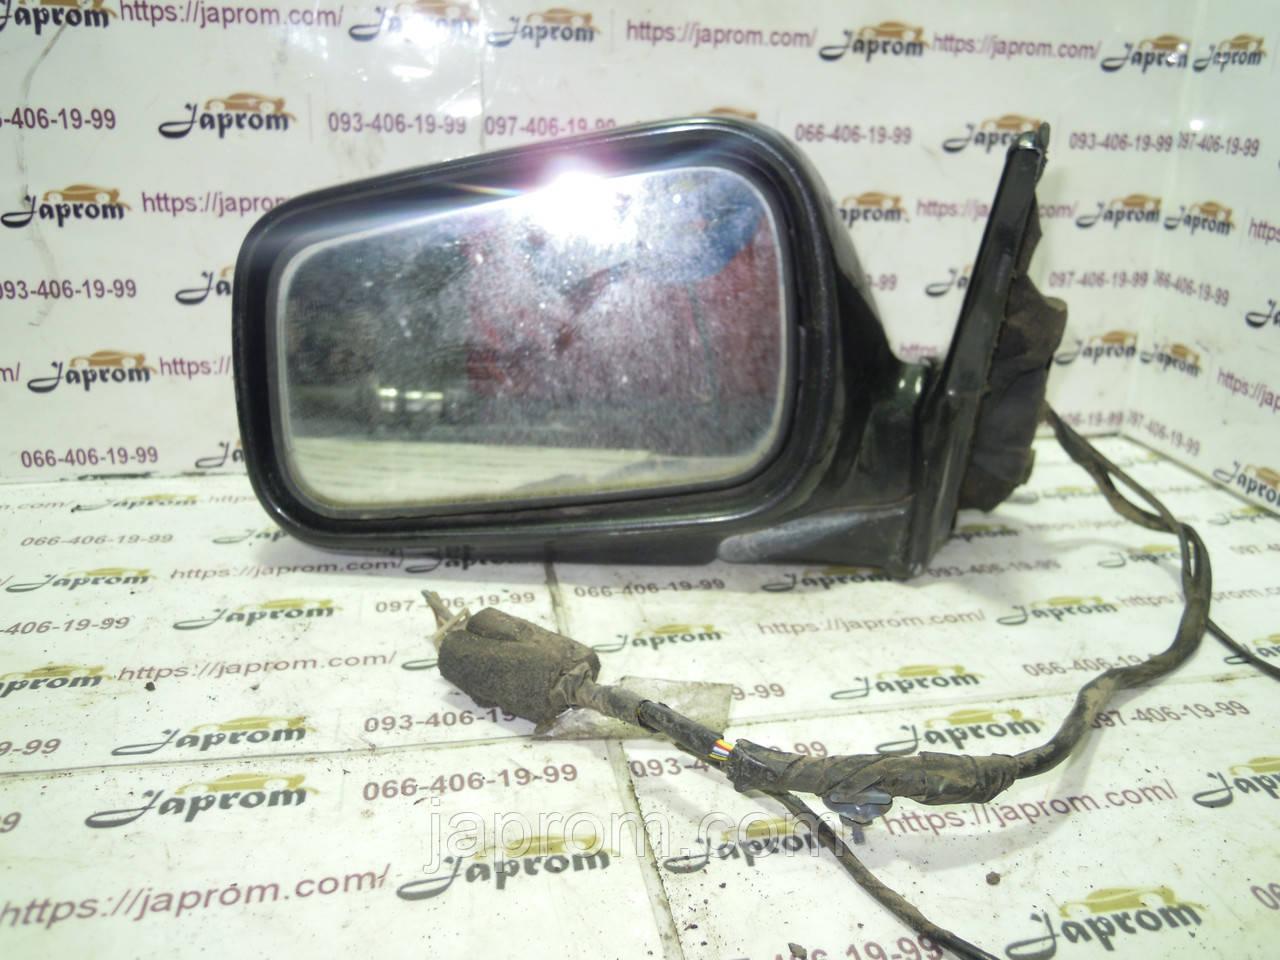 Зеркало заднего вида левое Honda Accord III 1985-1989г.в. седан черное